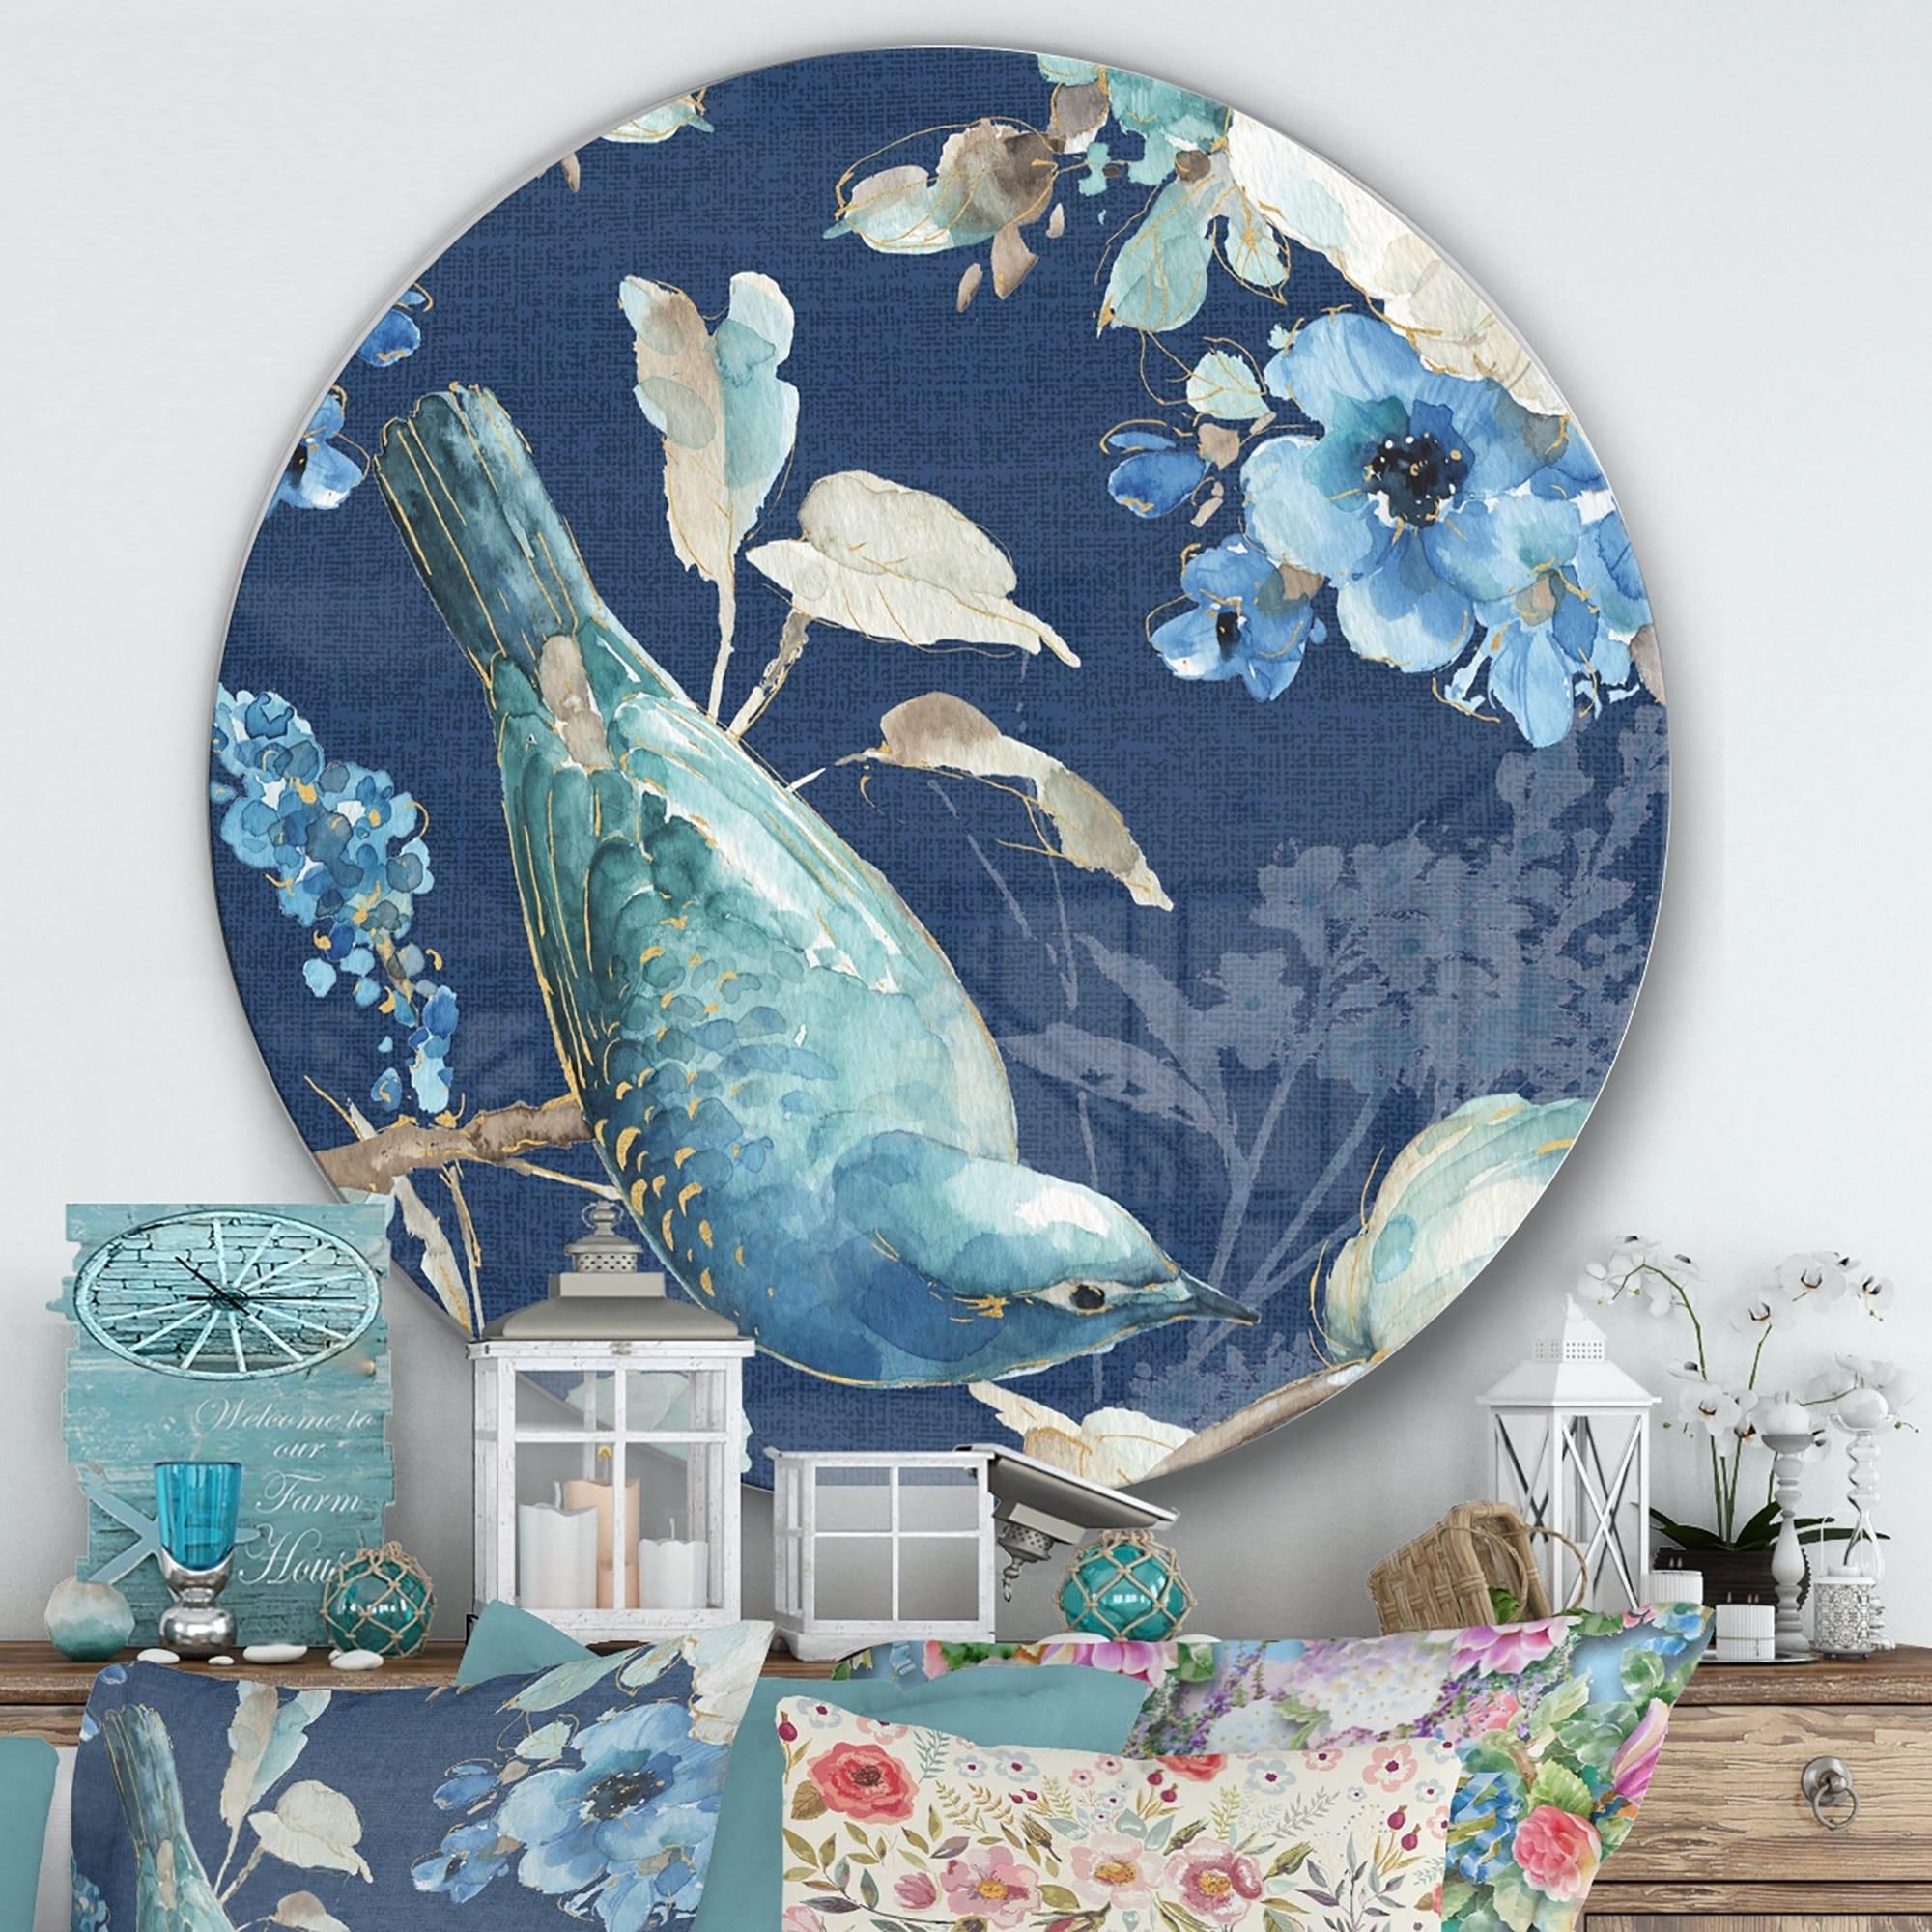 Metal Wall Art Decor Bird Flock Blue White Teal Color Sculpture by ZENDA IMPORTS